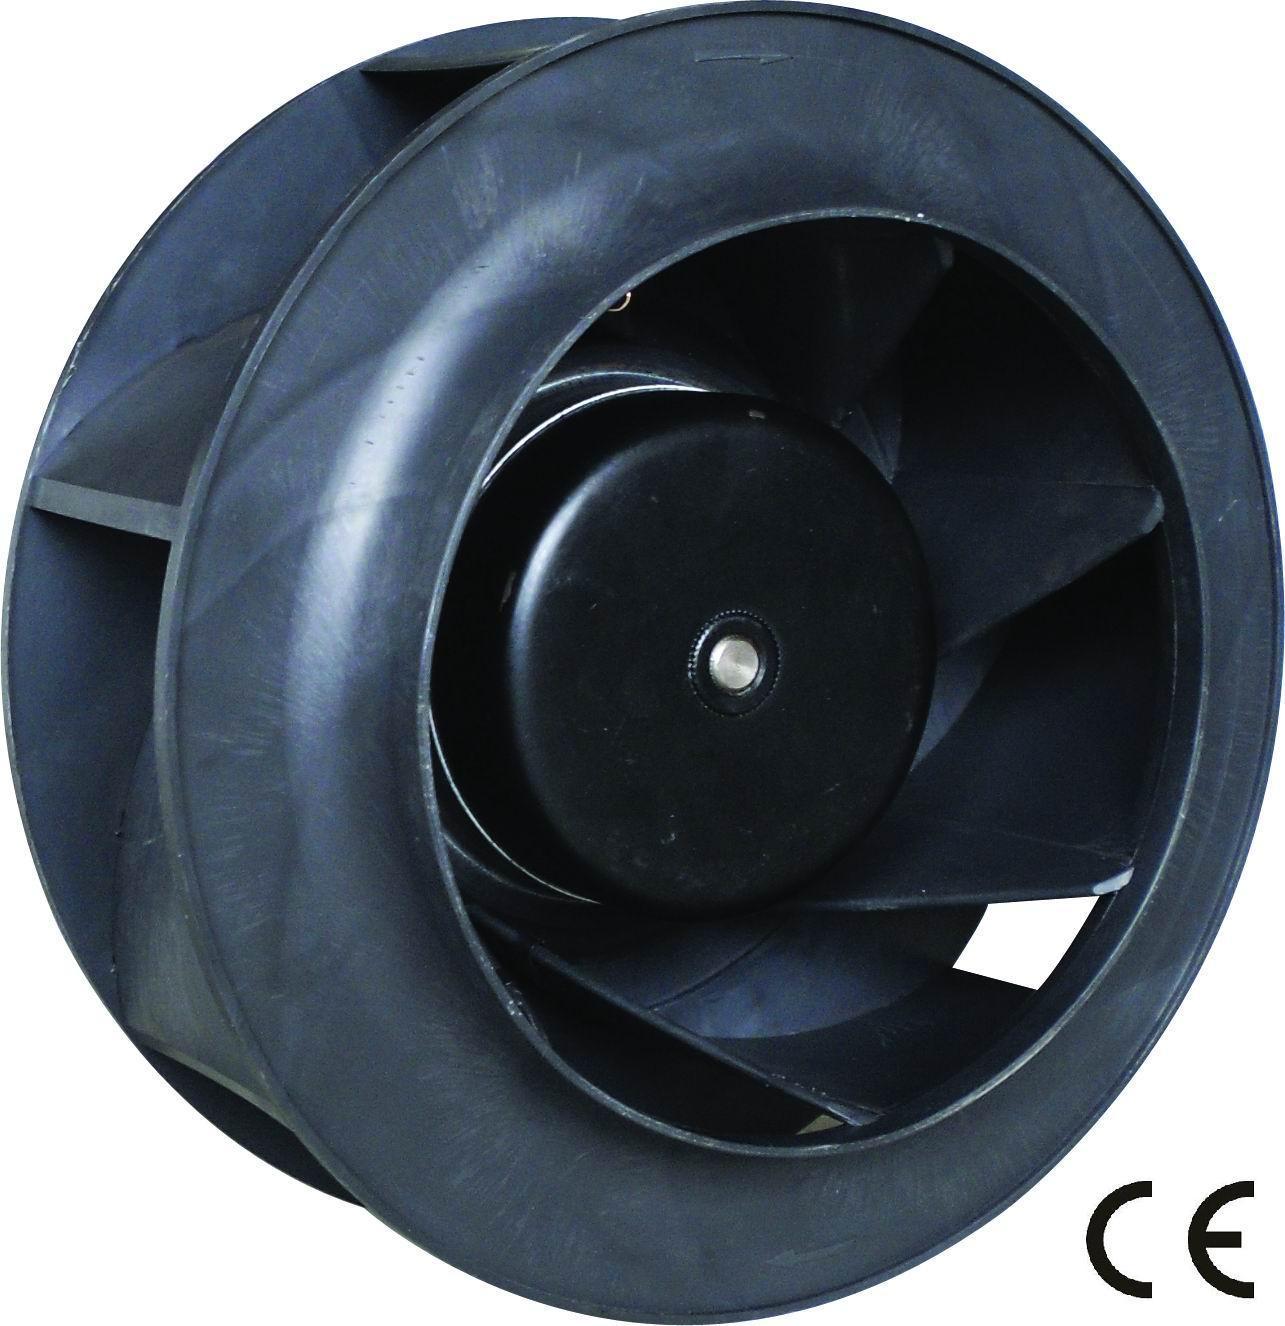 Industrial Exhaust Fans Ventilation : China ec industrial exhaust fan mm